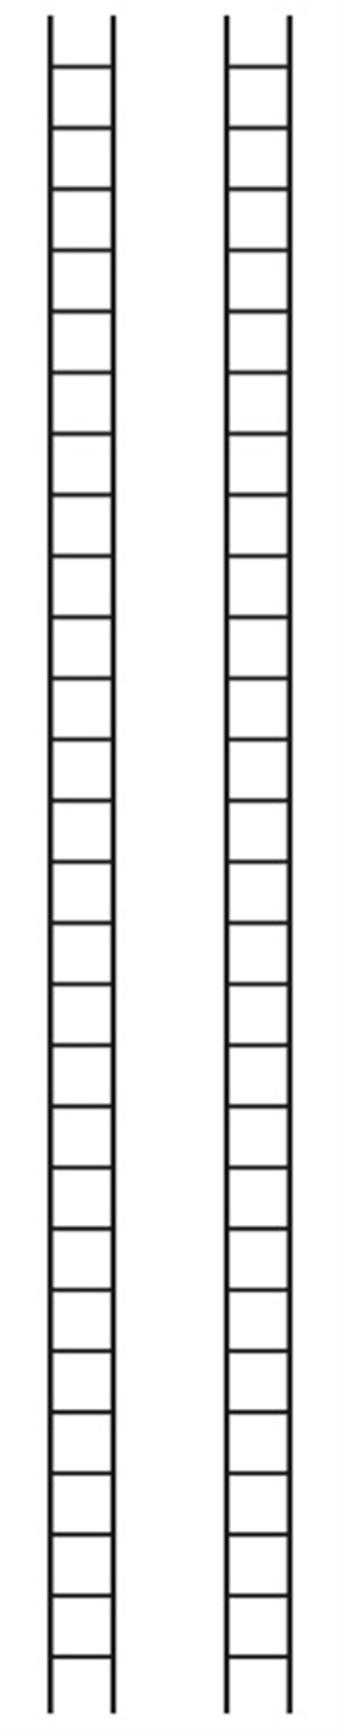 LK-748 Ladders - 175mm